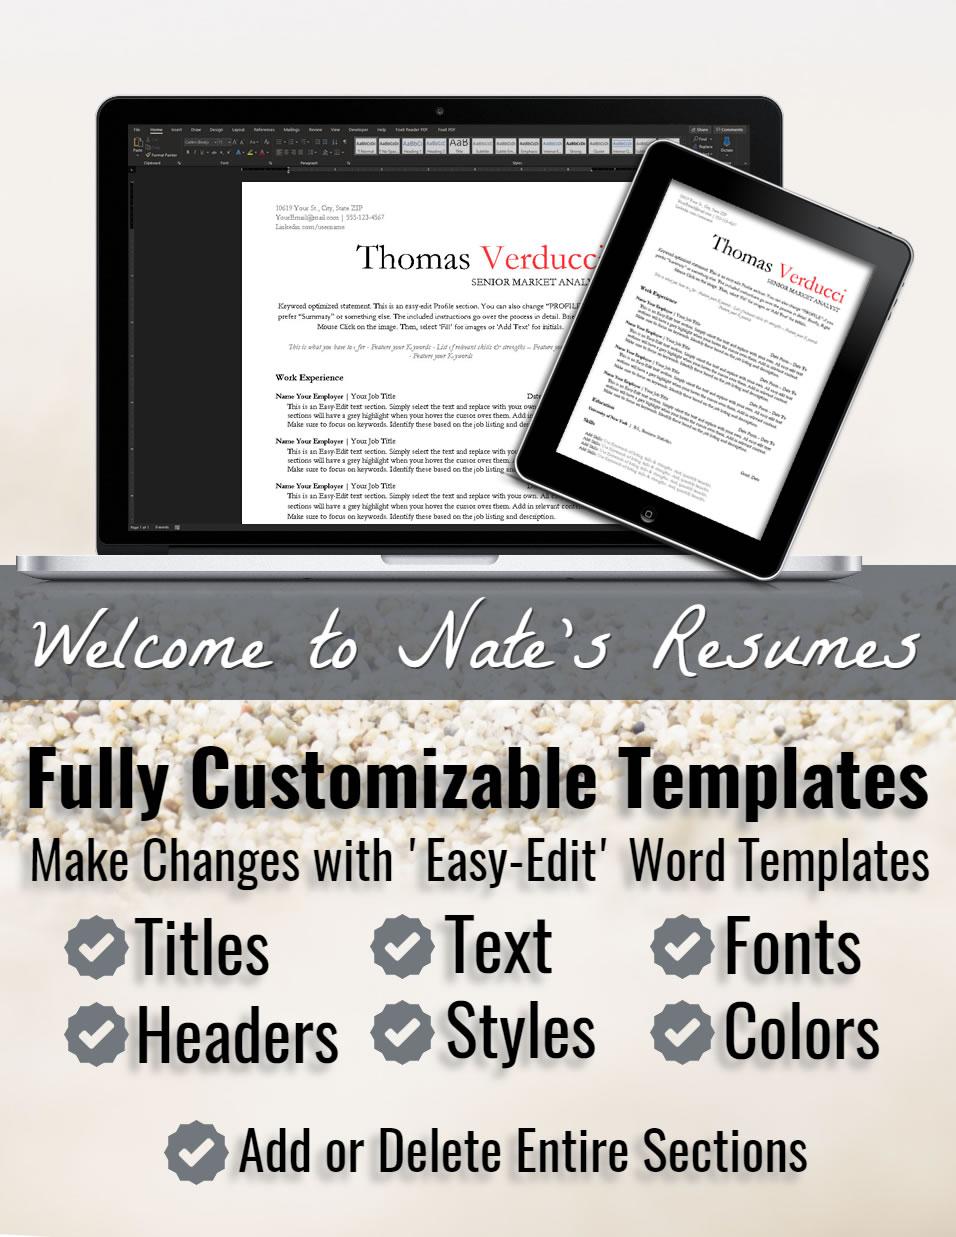 Pro Bold - Make-Easy-Edits-to-Templates-LONG